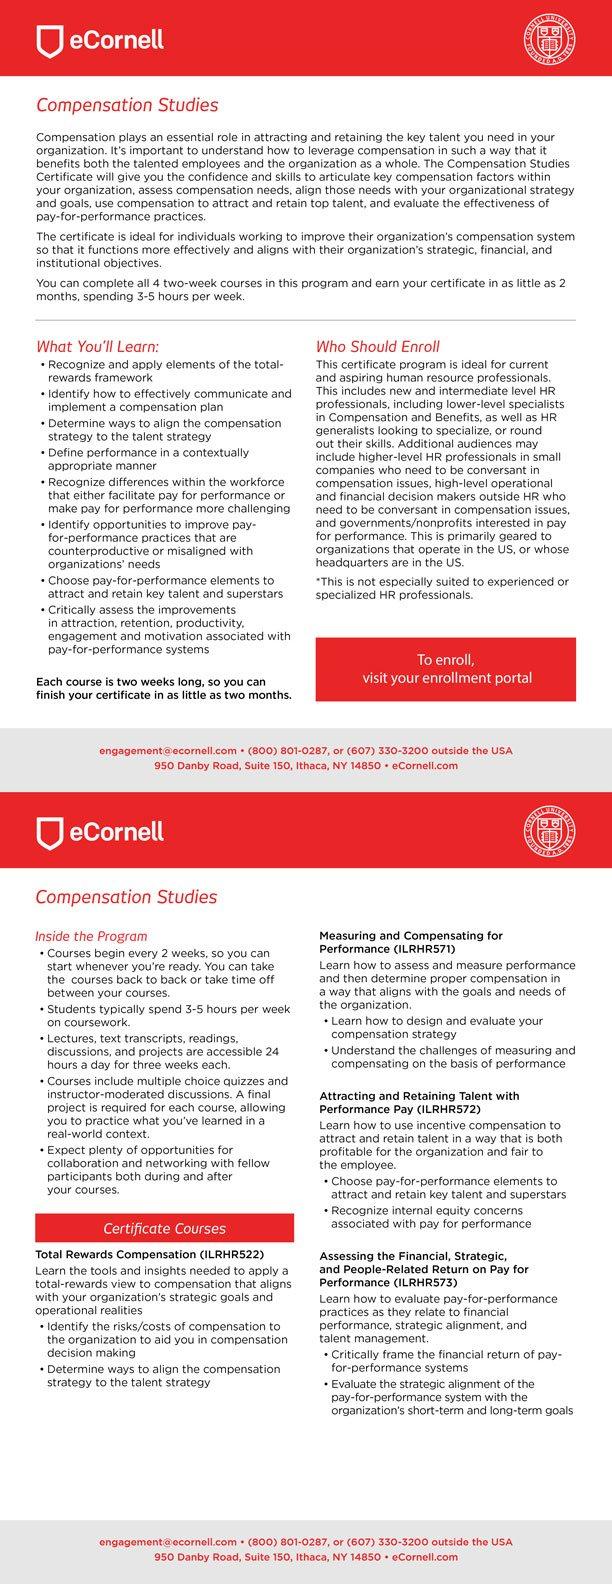 Compensation Studies Corporate Flyer